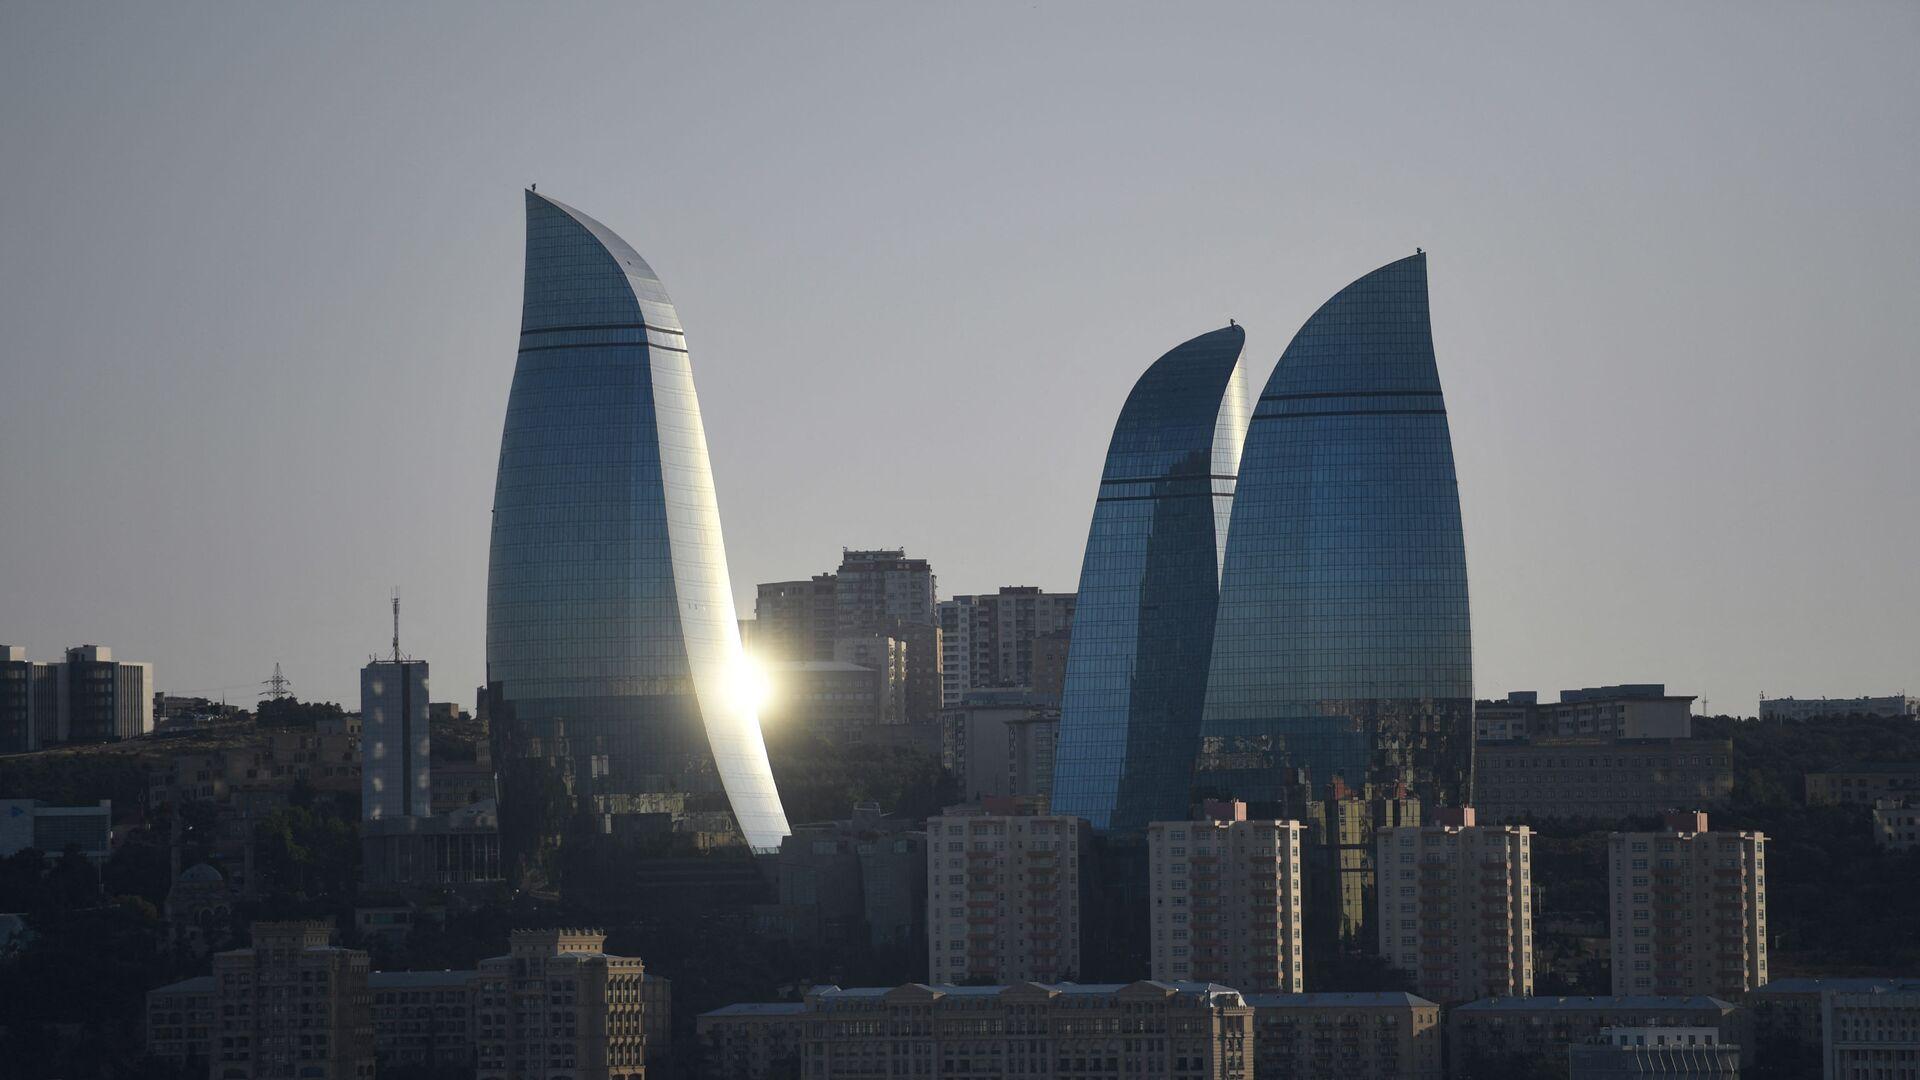 Вид на Flame Towers (Пламенные башни) в Баку, фото из архива - Sputnik Азербайджан, 1920, 17.06.2021